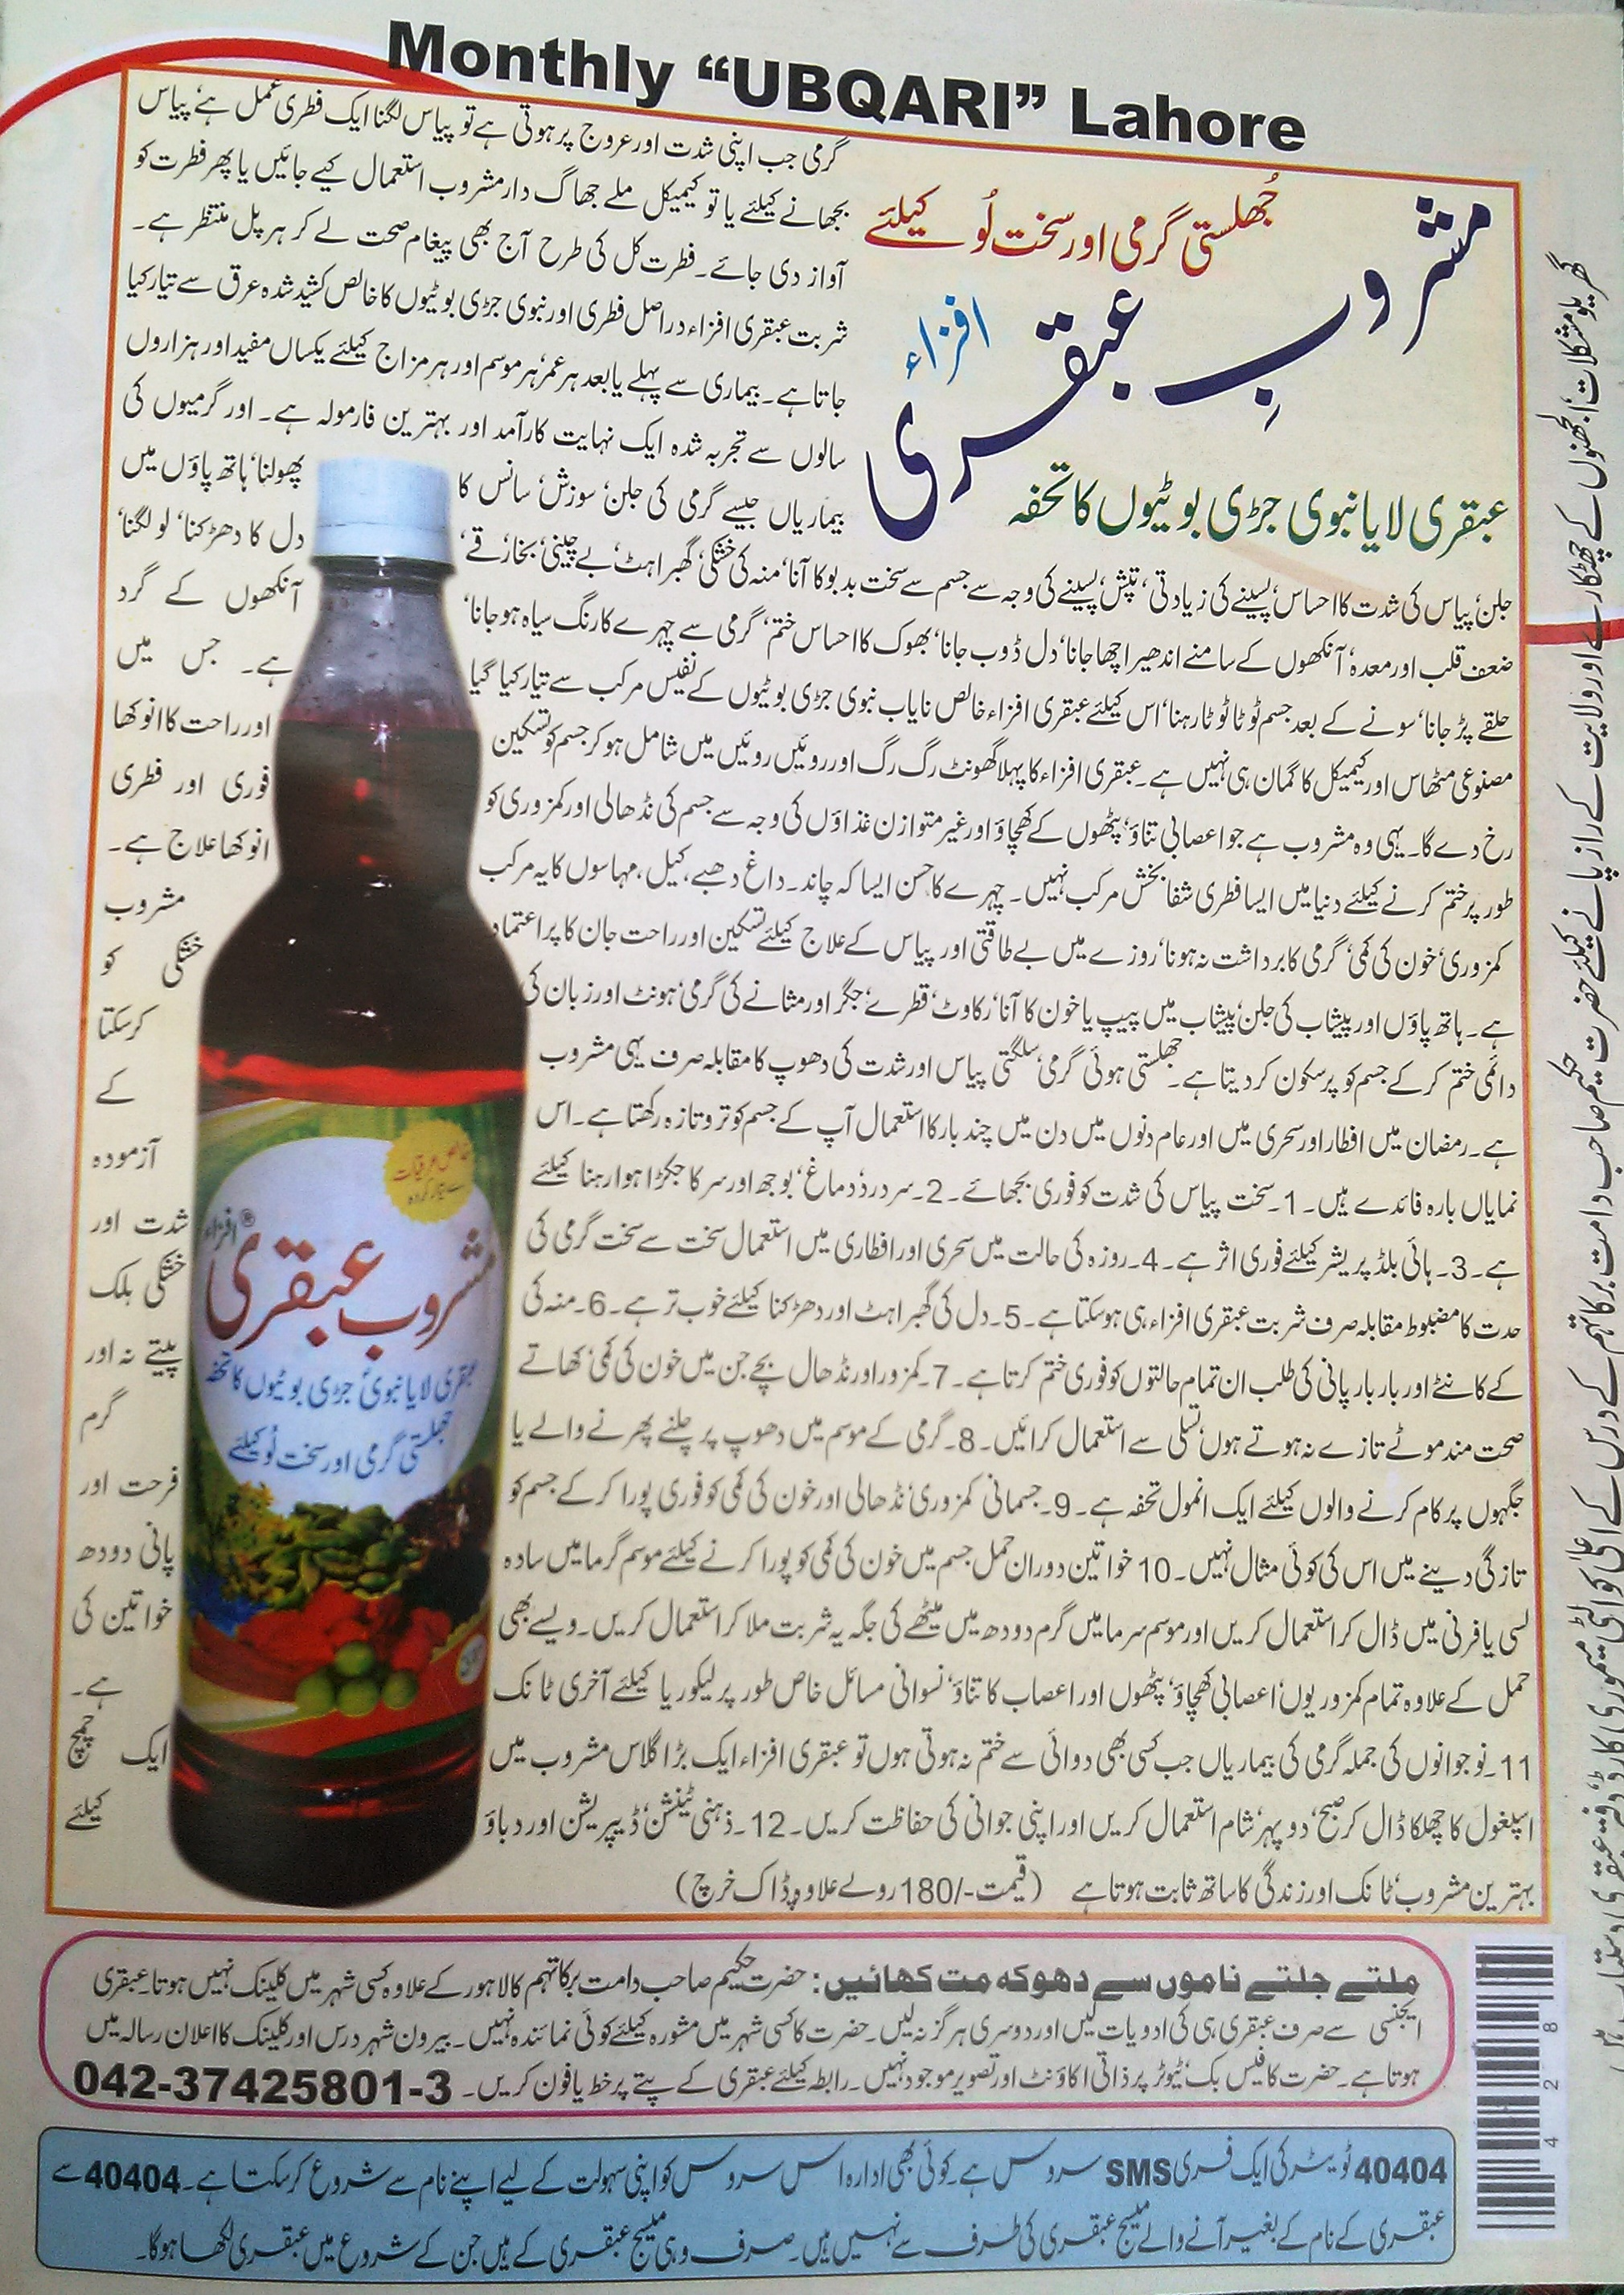 ubqari-march-2015-jhangtv-com (53)